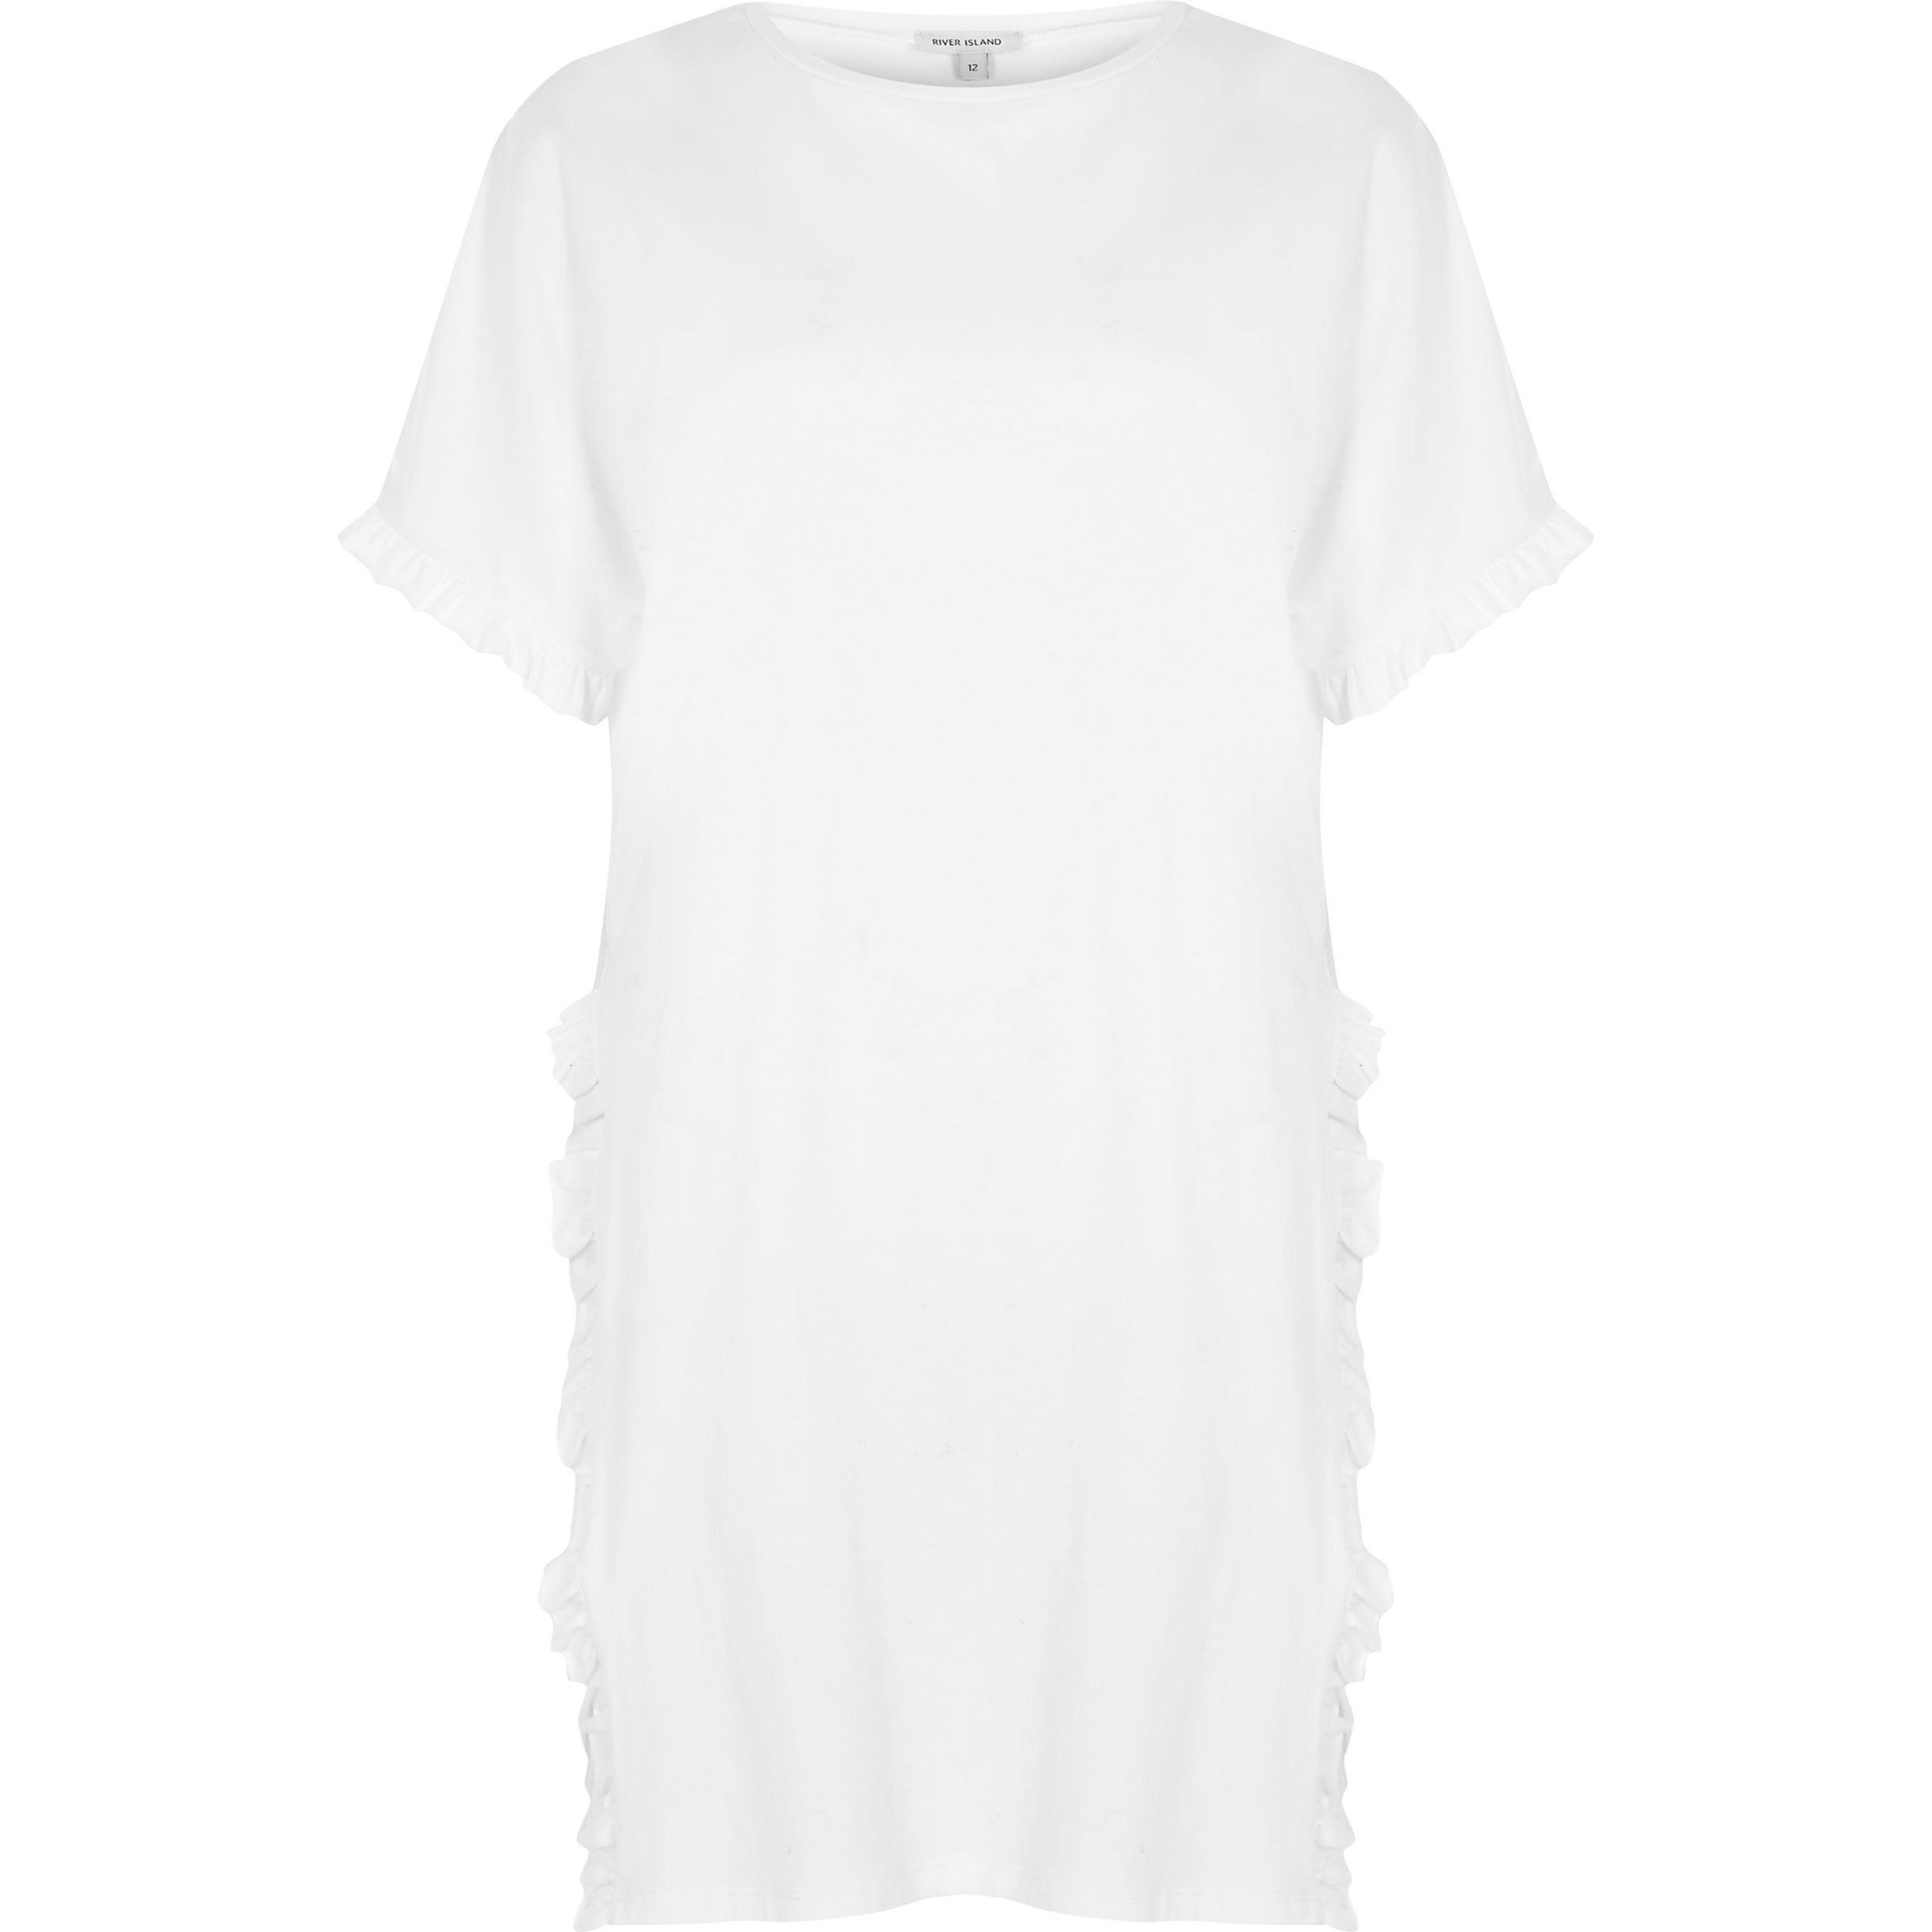 2f9ac95e09a04 River Island White Frill Side Split Oversized T-shirt in White - Lyst